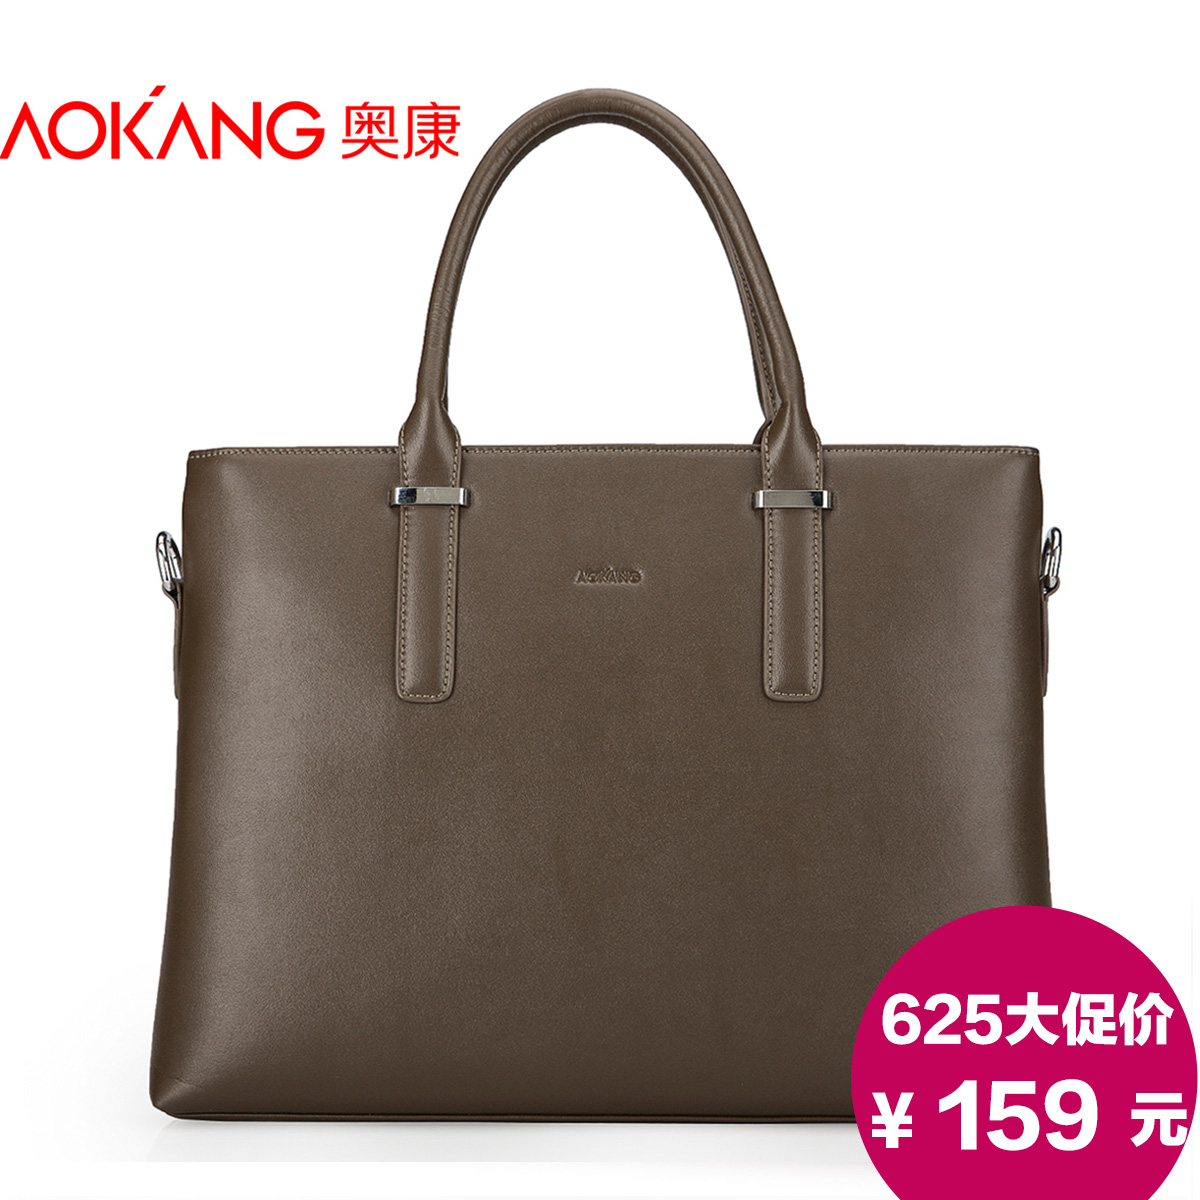 сумка Aokang 8334223041a